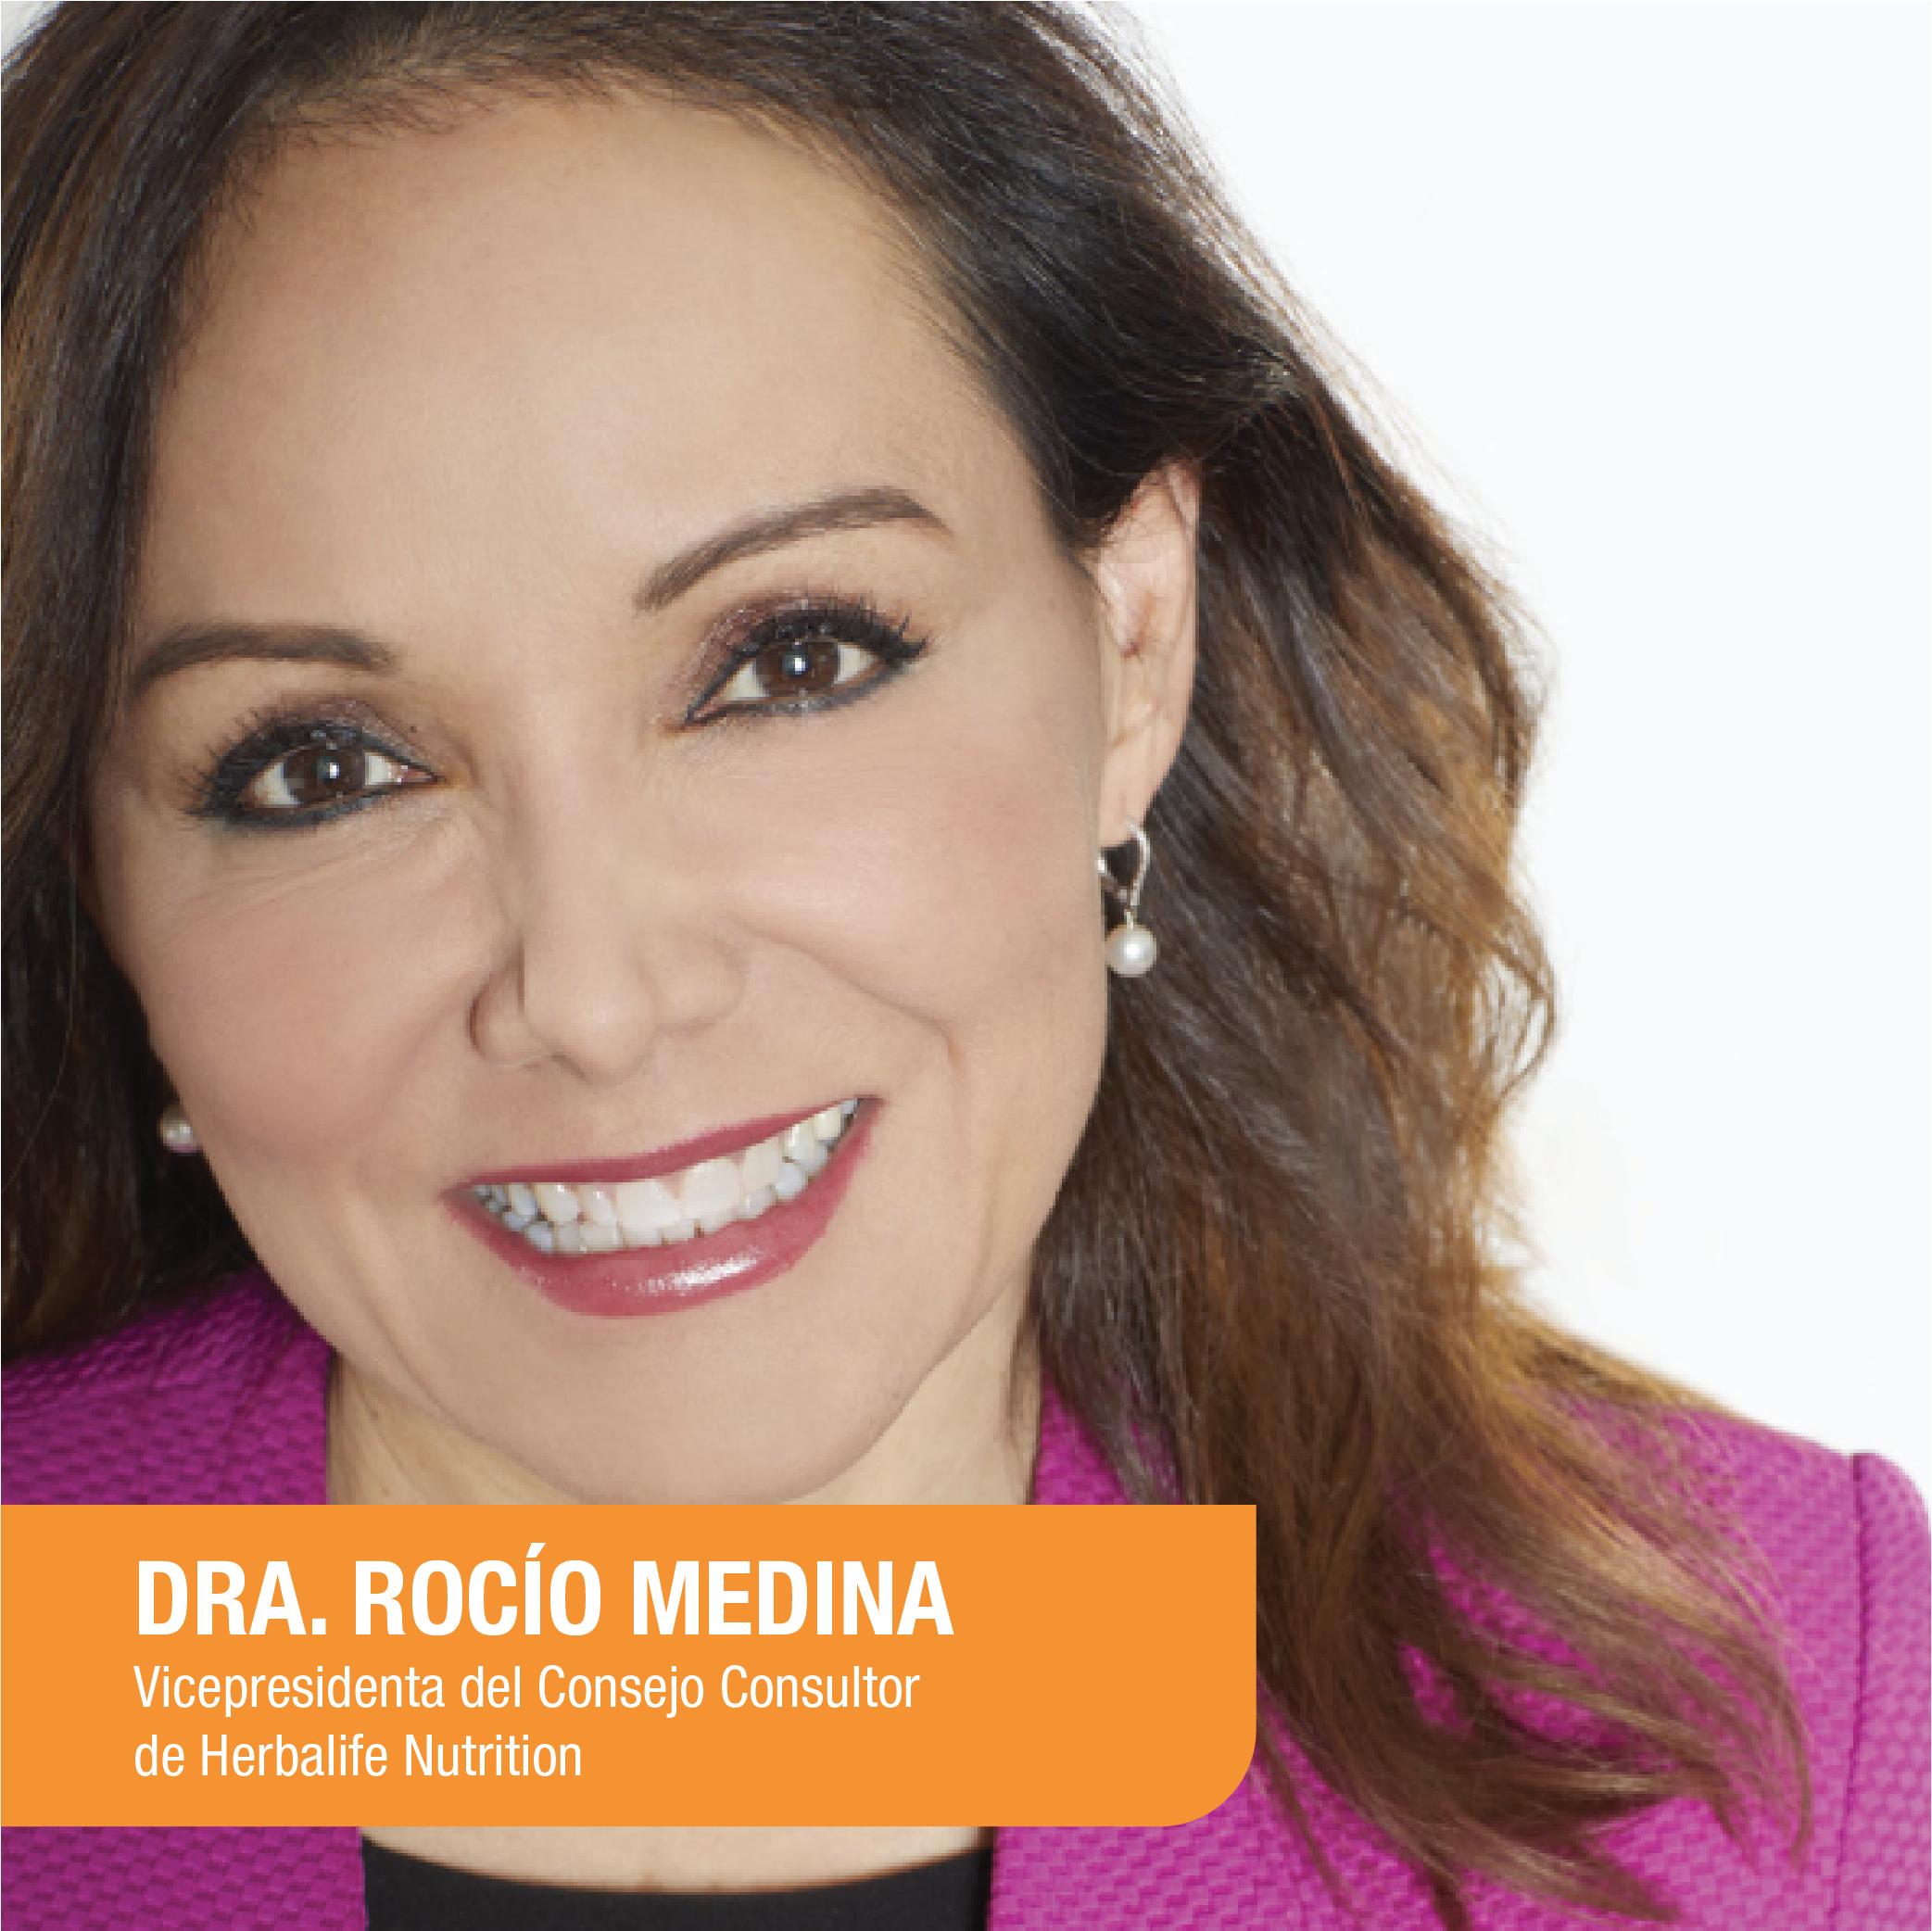 Dra. Rocío Medina